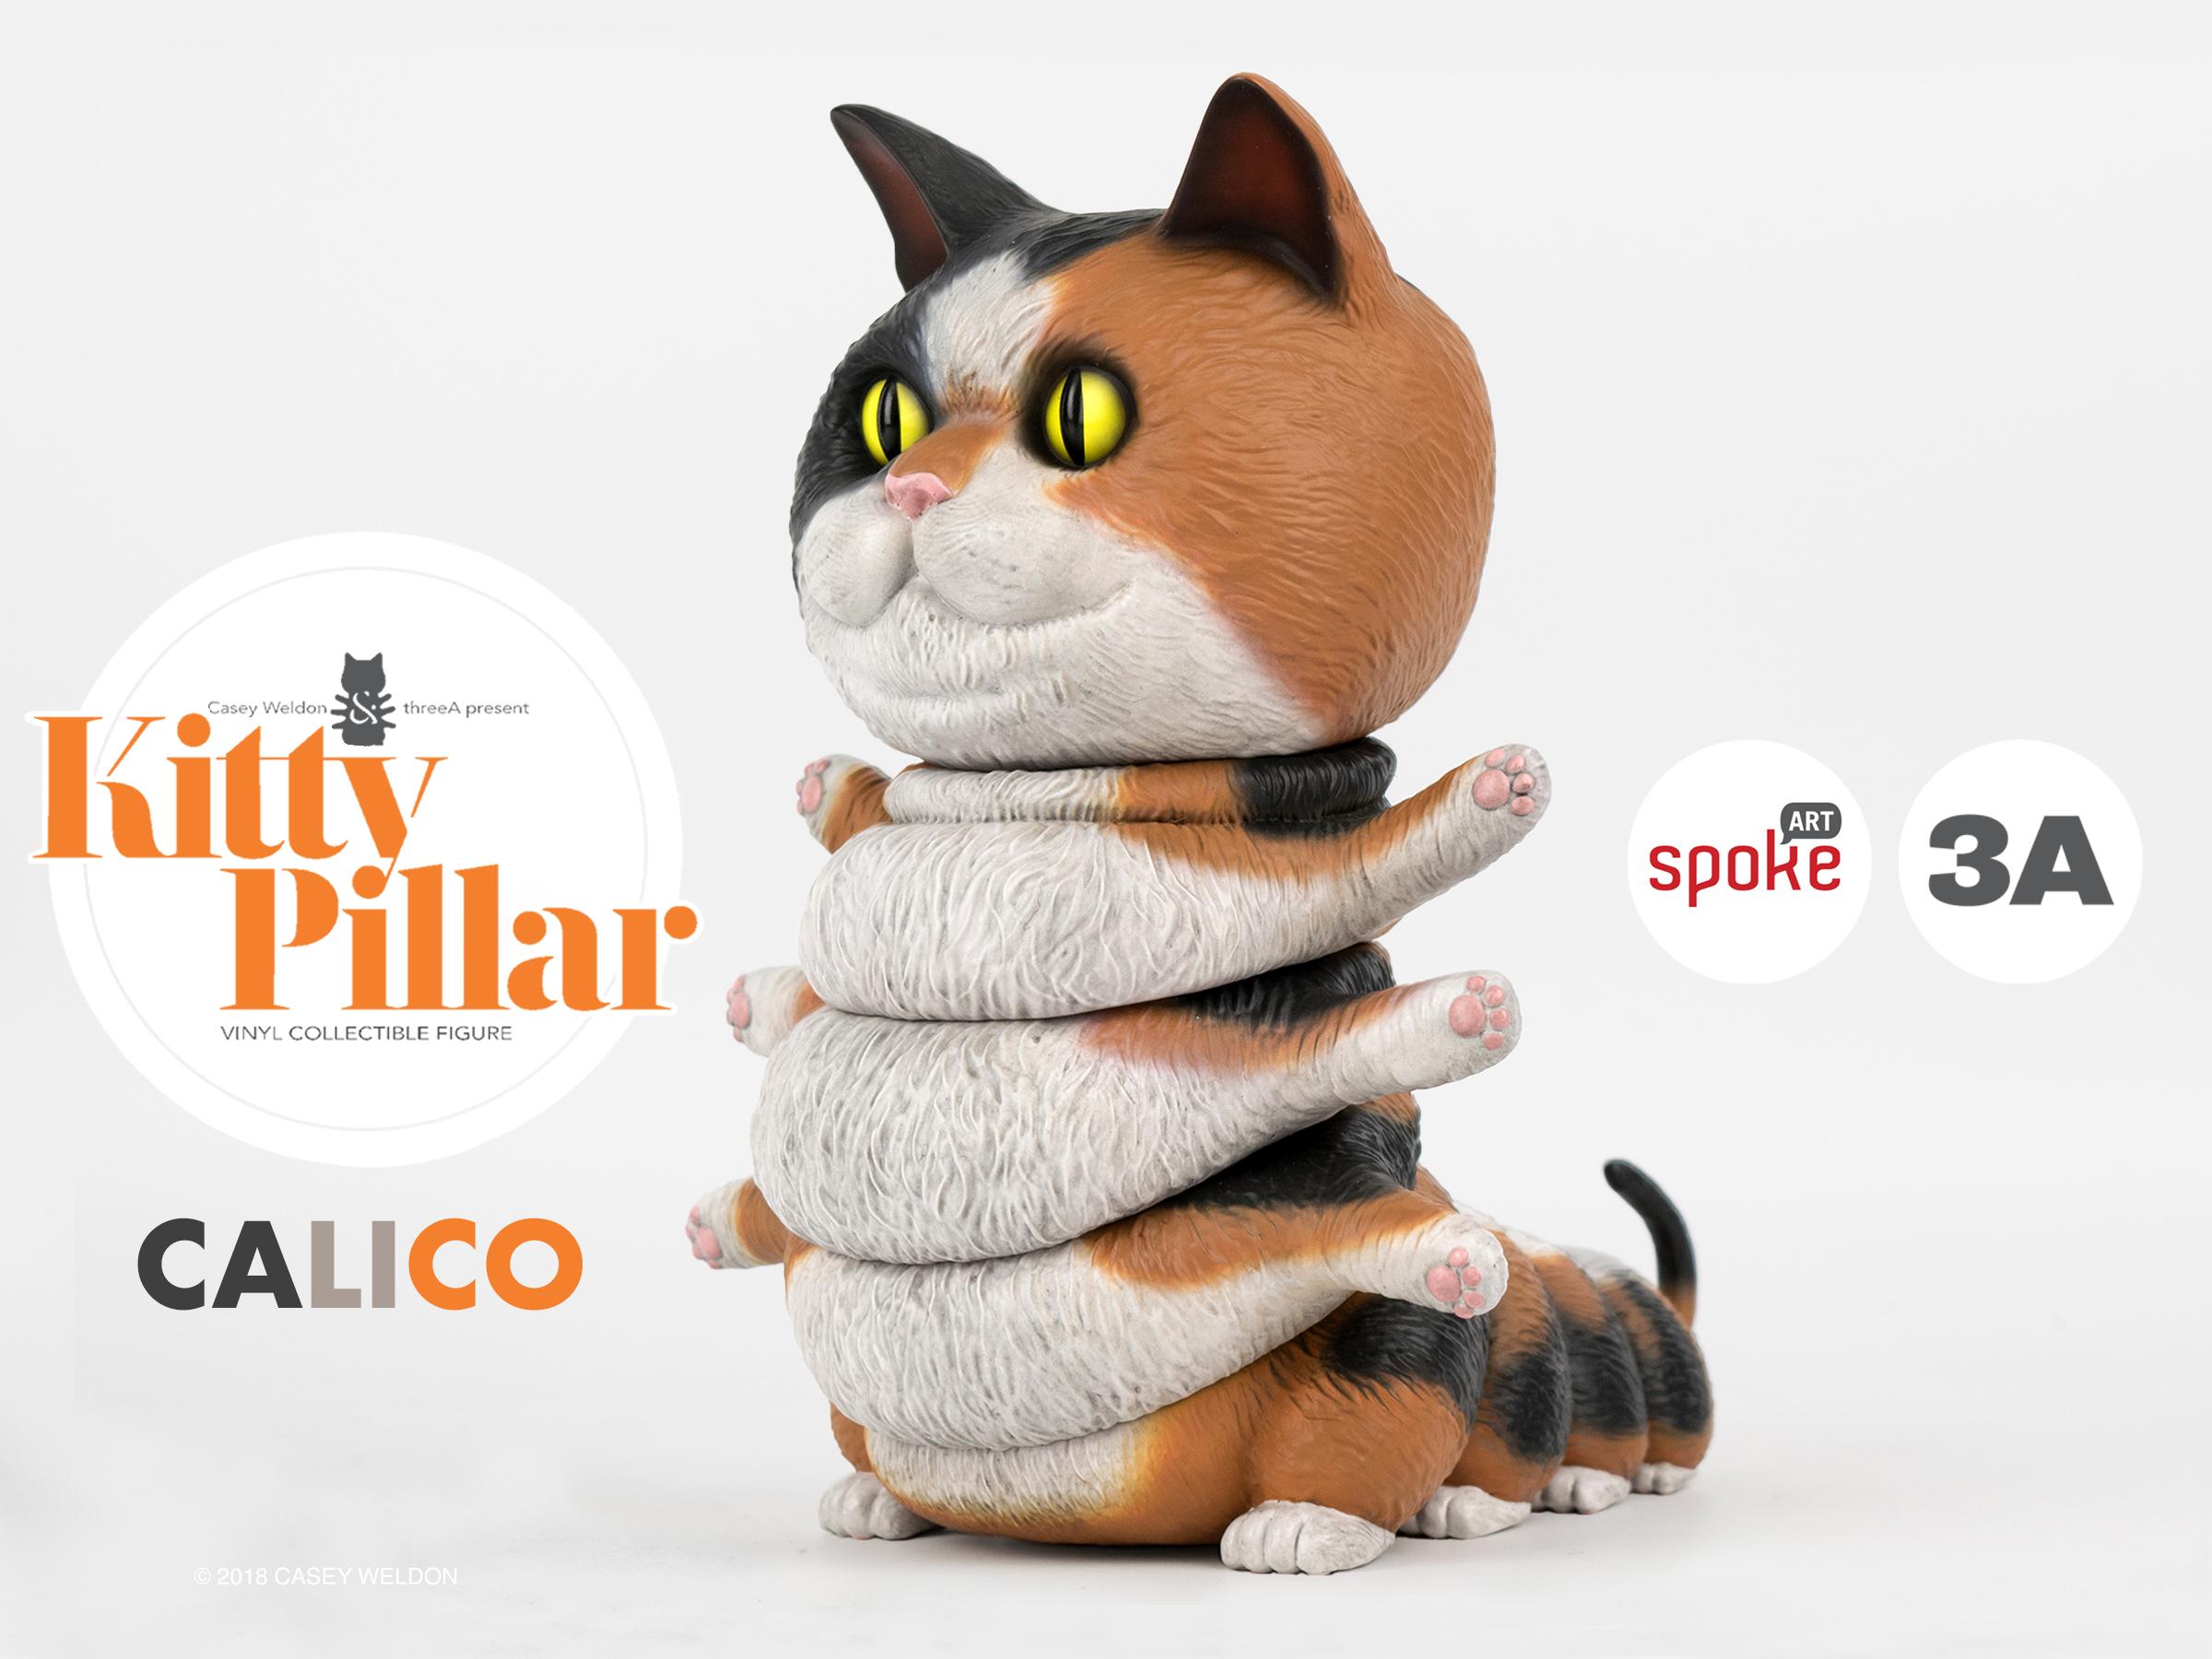 Calico Kittypillar now available at Spoke Art!